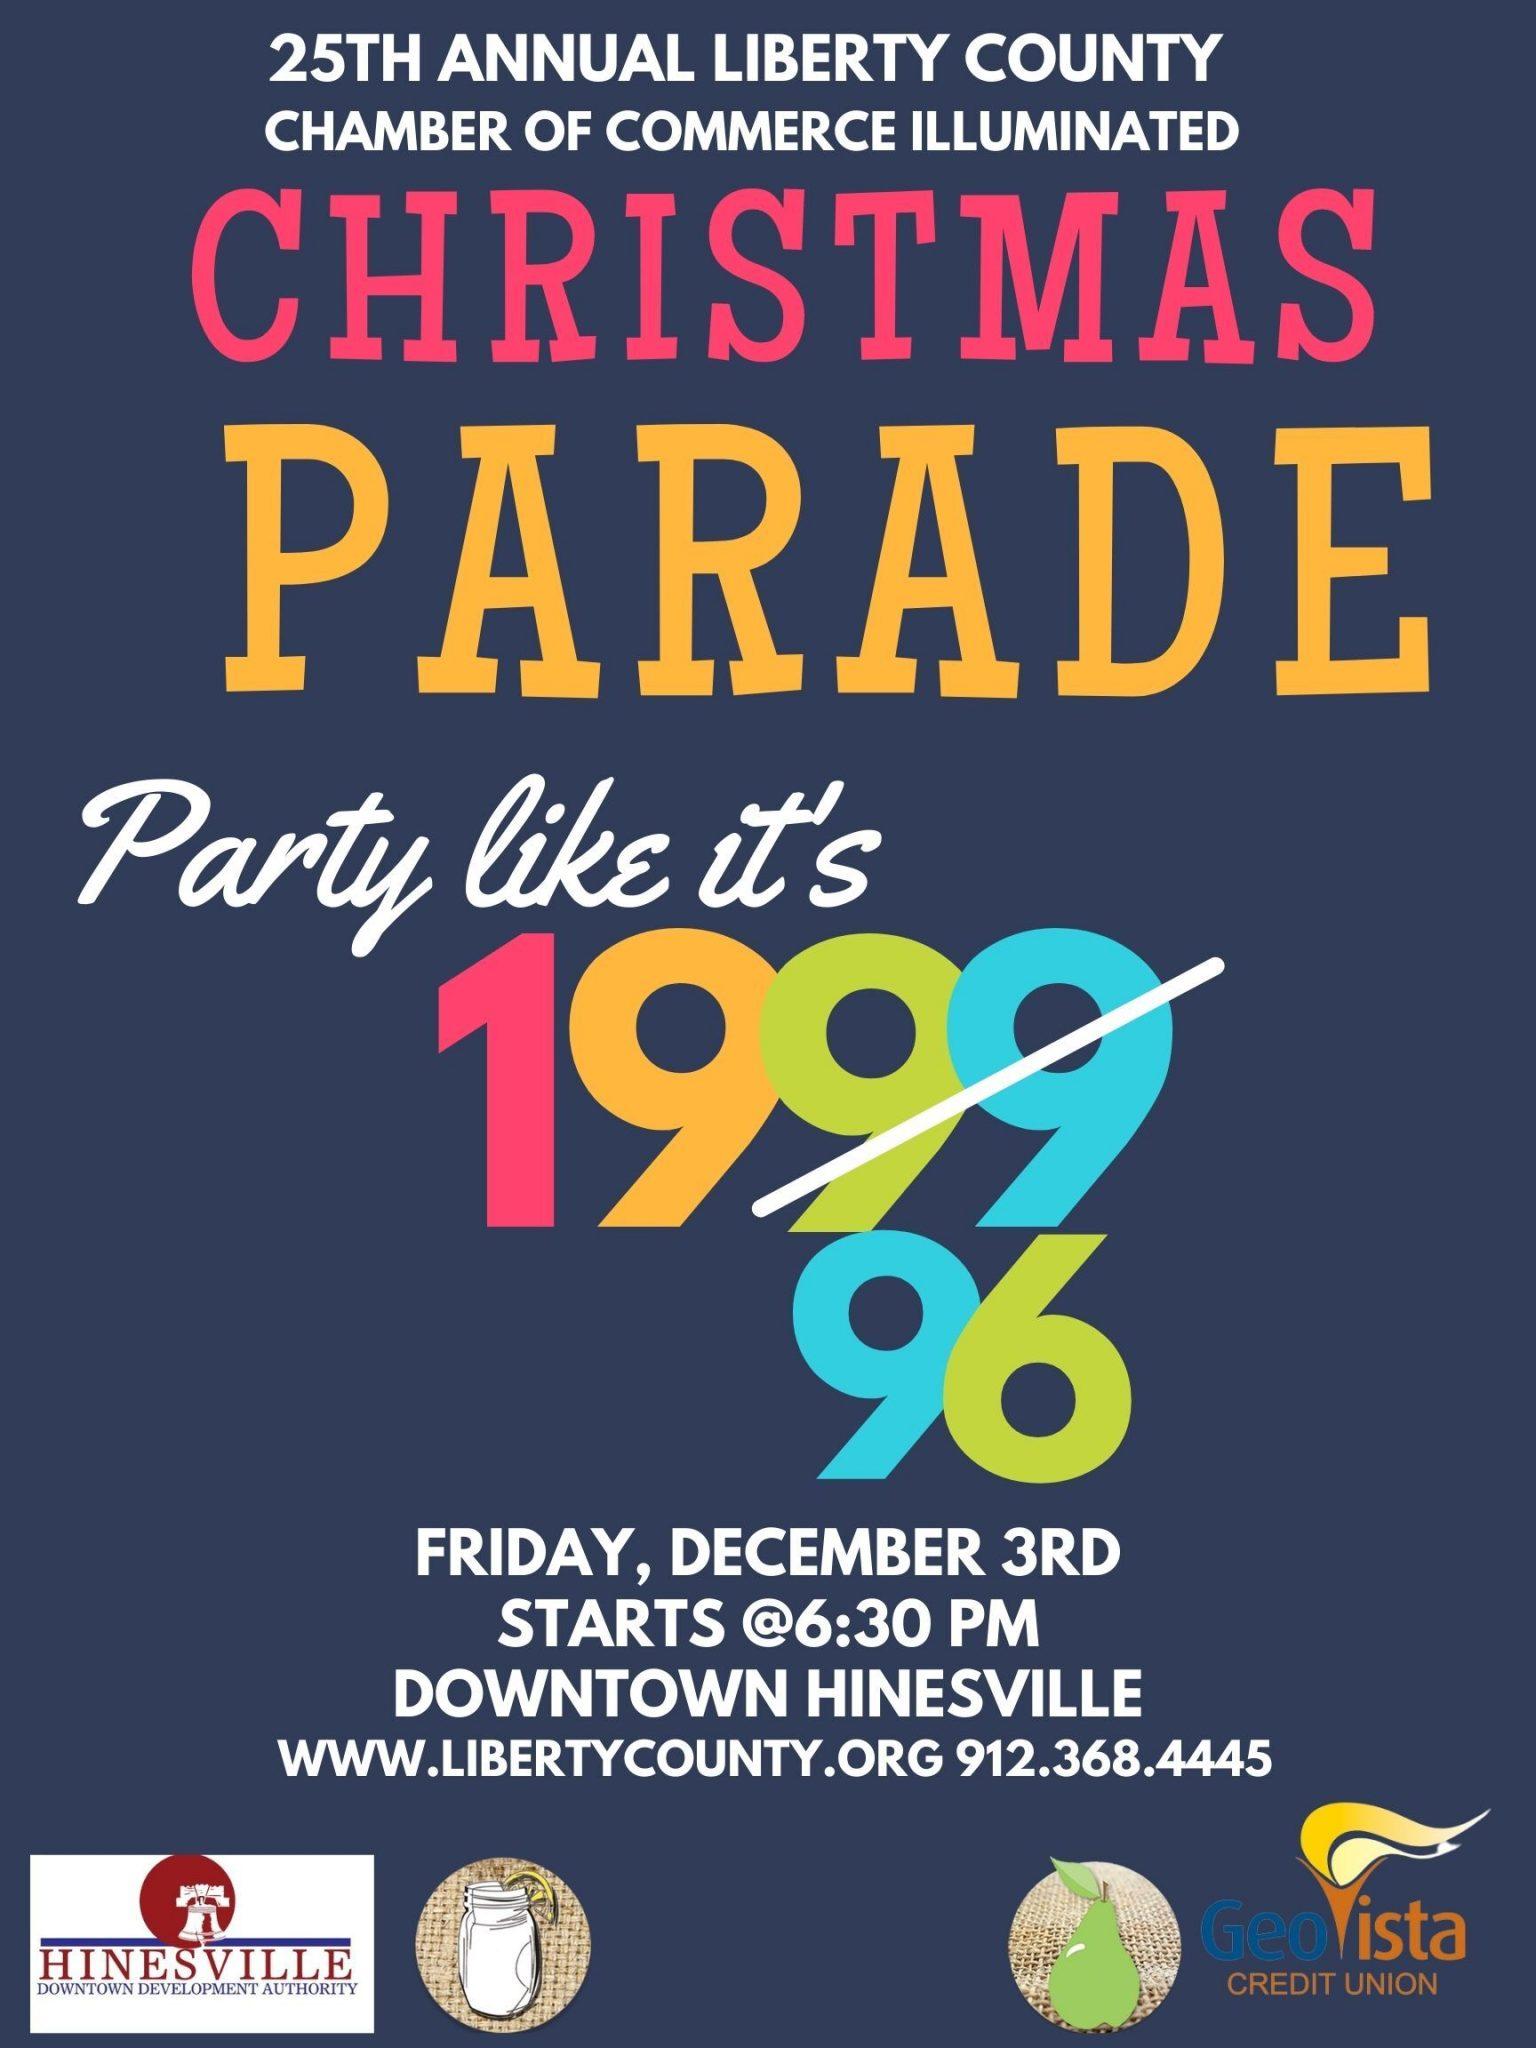 25th Annual Christmas Parade